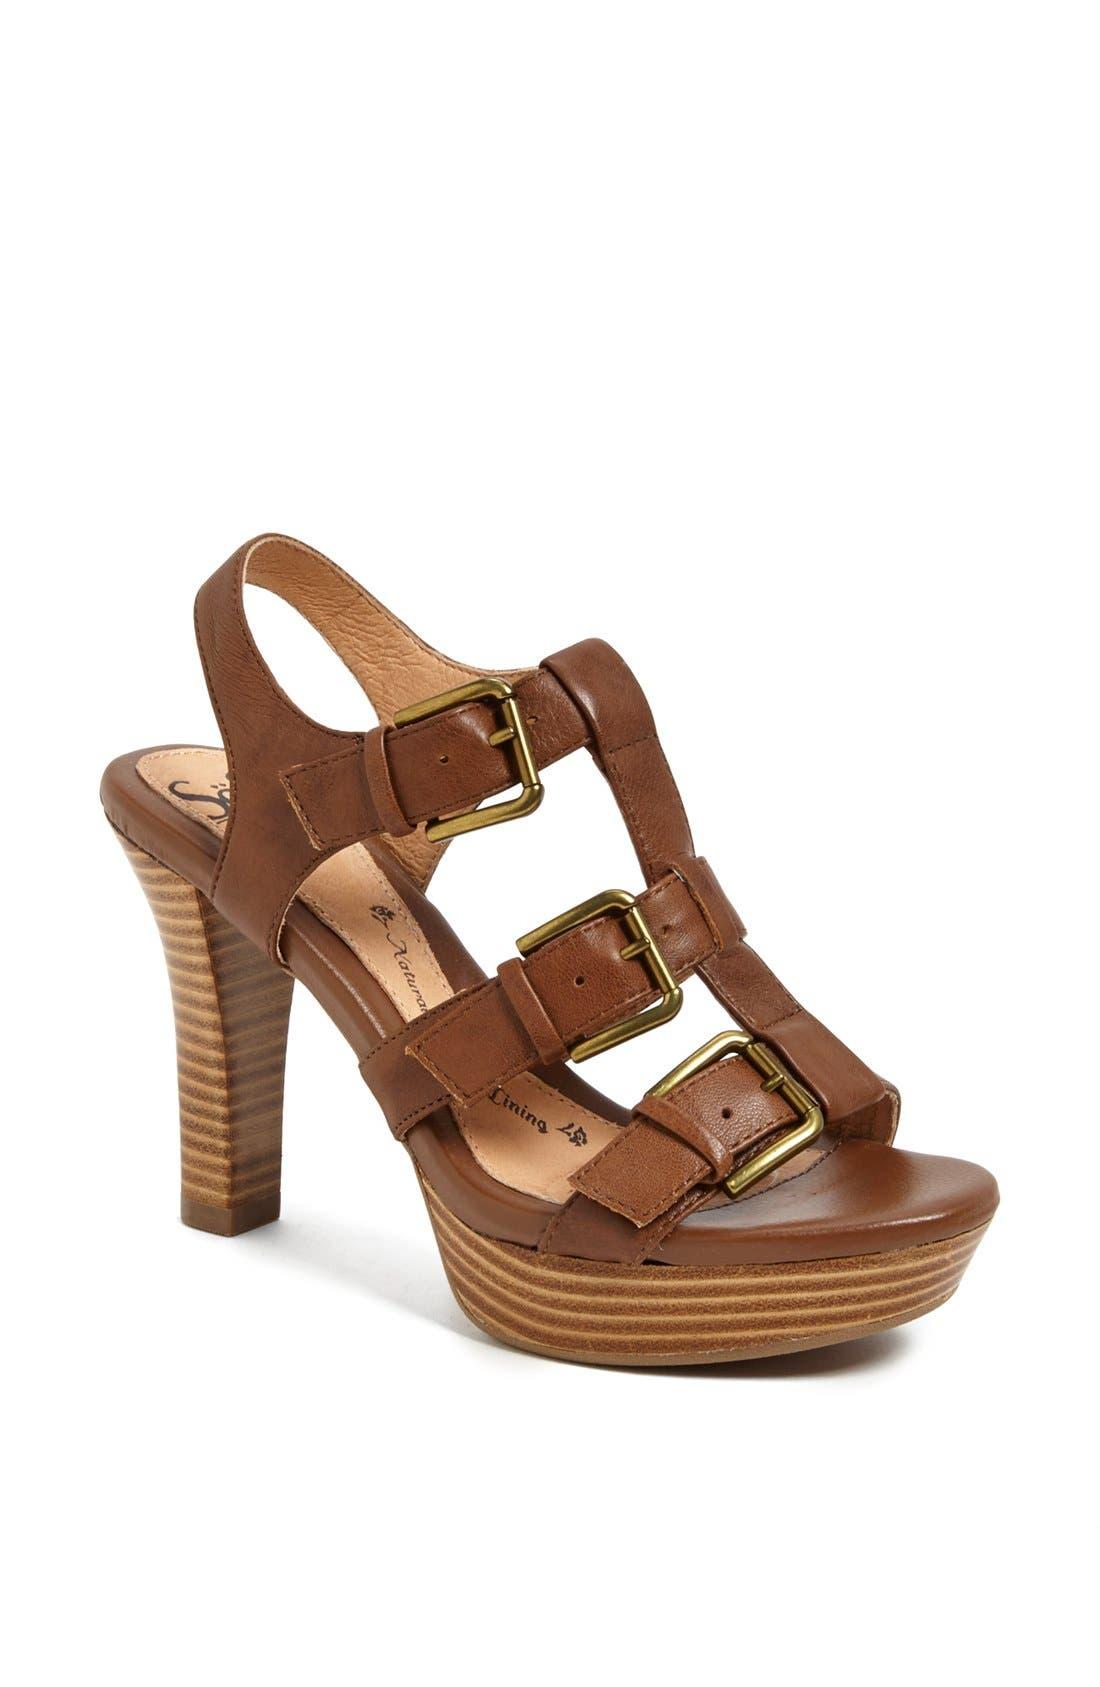 Alternate Image 1 Selected - Söfft 'Savannah' Sandal